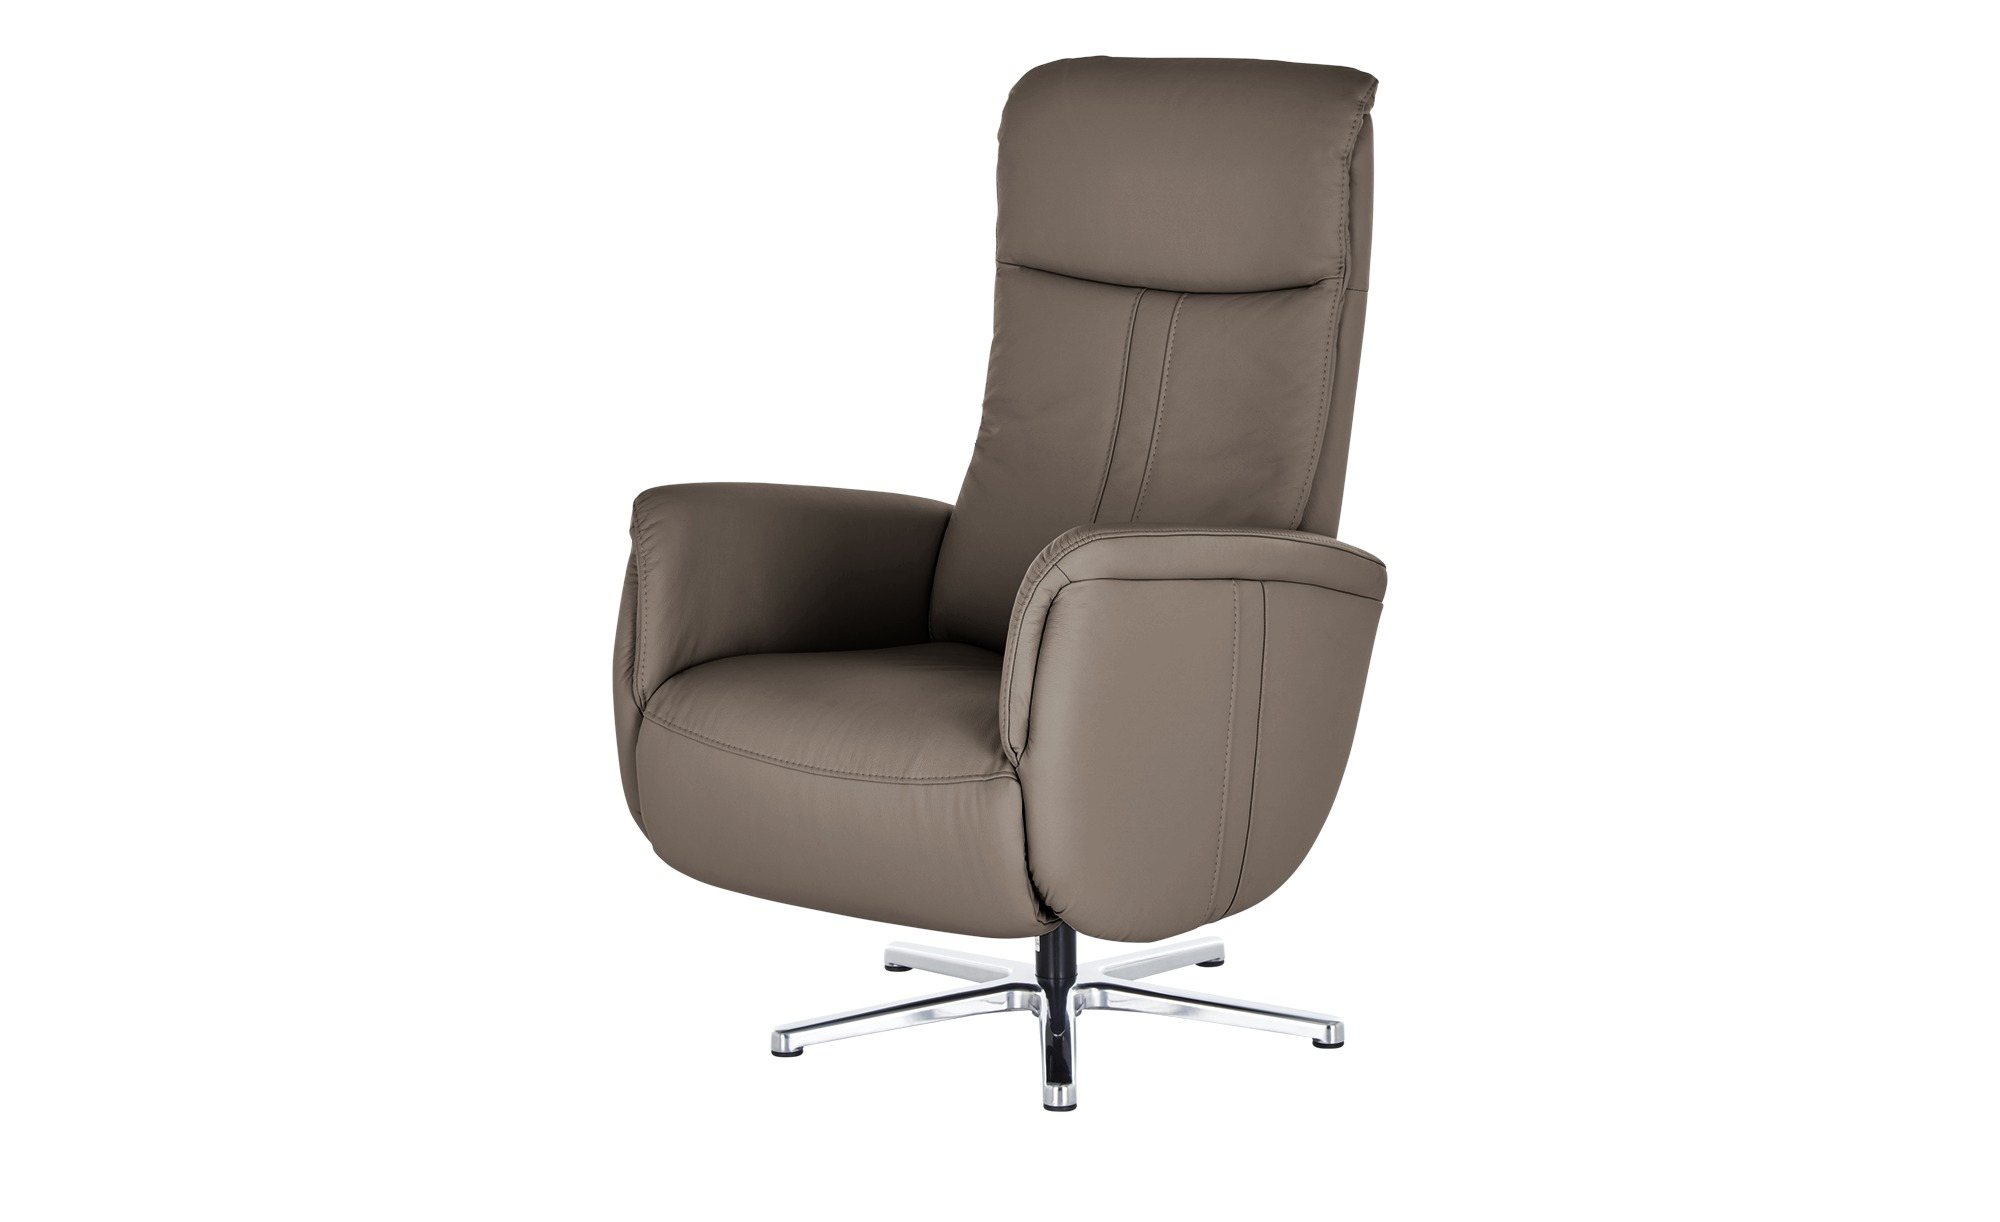 meinSofa Relaxsessel  Franzi-L ¦ braun ¦ Maße (cm): B: 71 H: 112 T: 83 Polstermöbel > Sessel > Fernsehsessel - Höffner